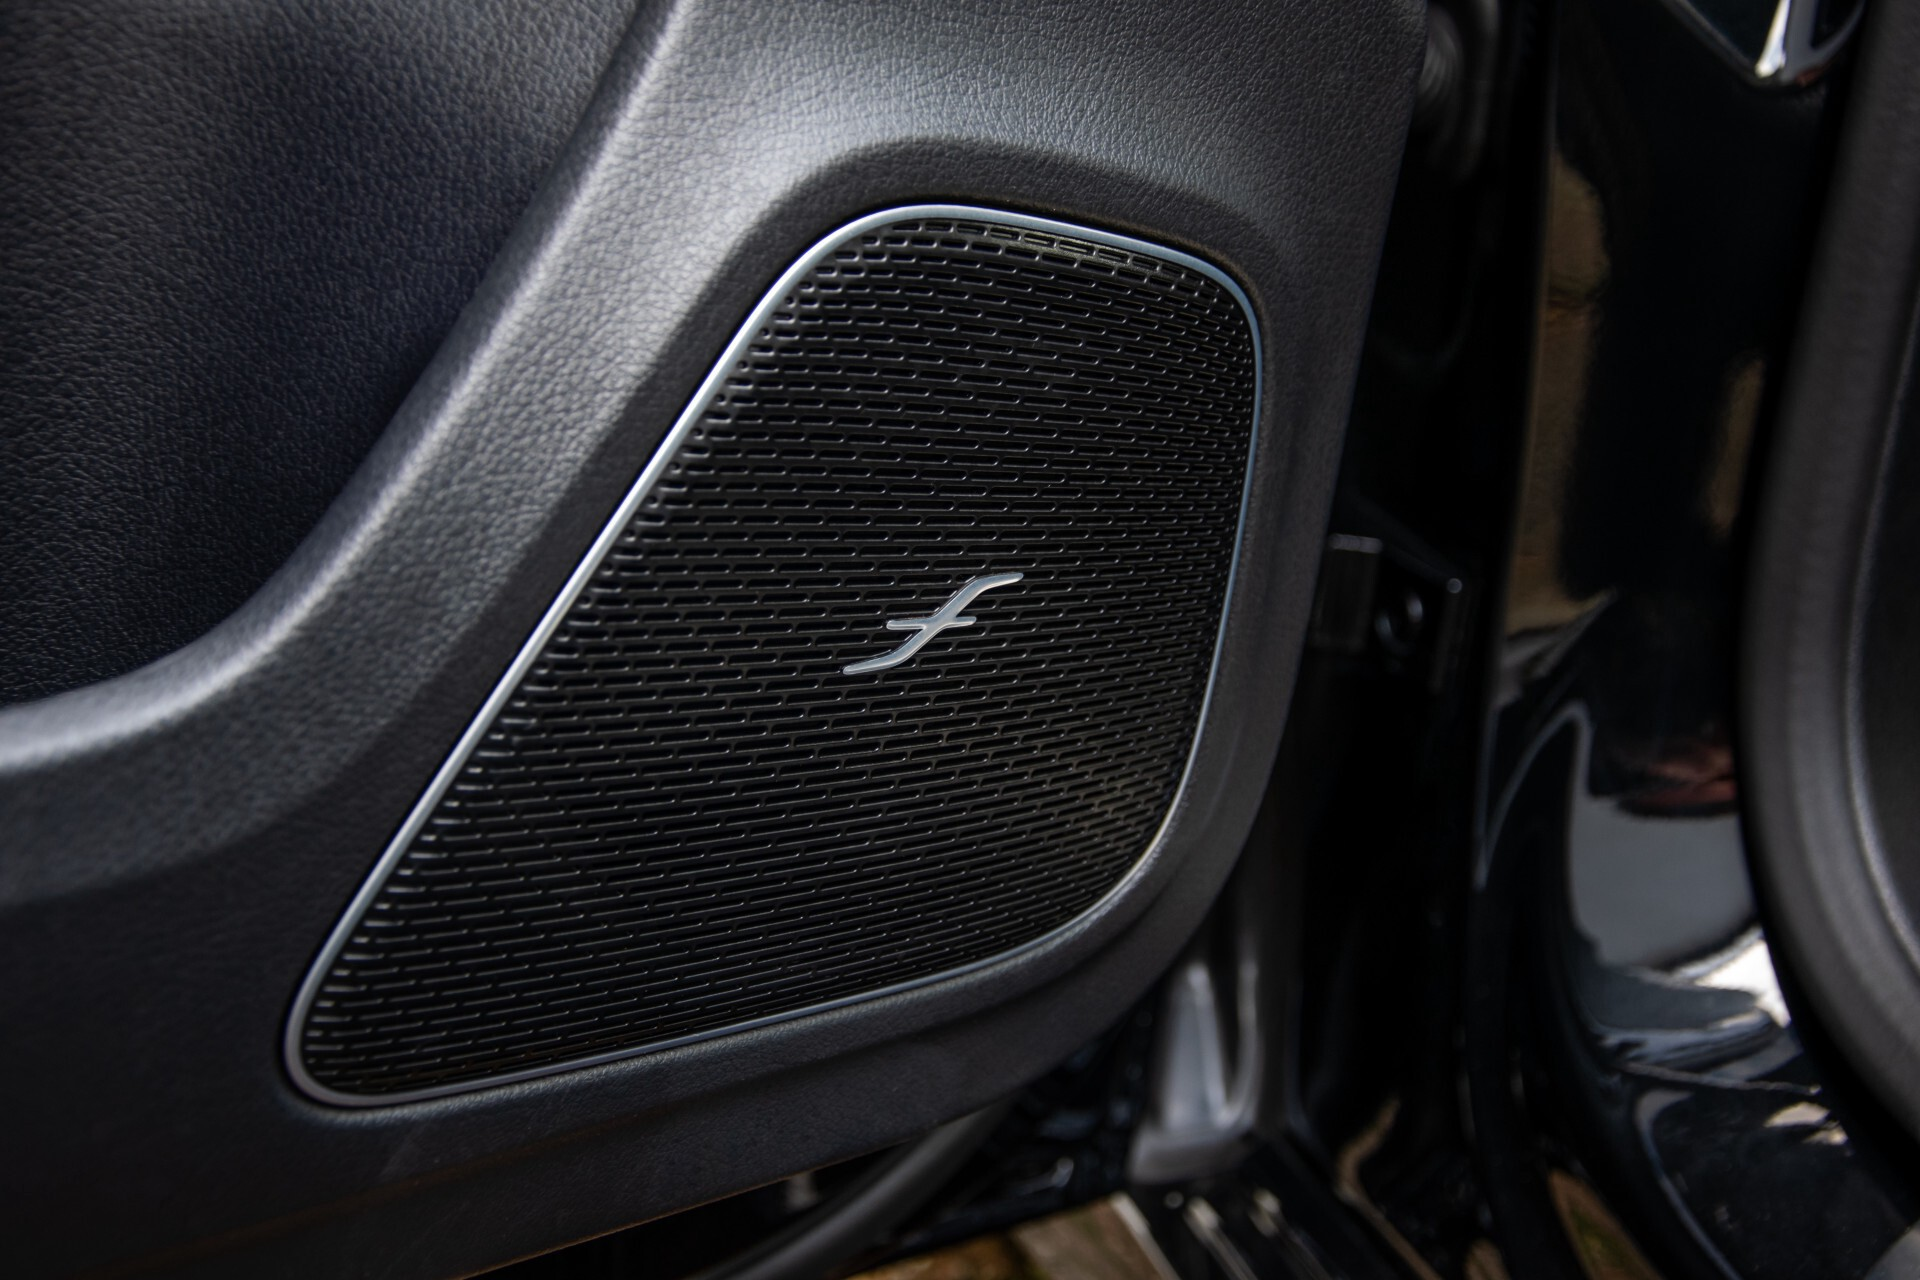 Mercedes-Benz A-Klasse 250 4-M AMG Panorama/Keyless-Entry/MBUX/HUD/Burmester/360/Multibeam LED Aut7 Foto 39